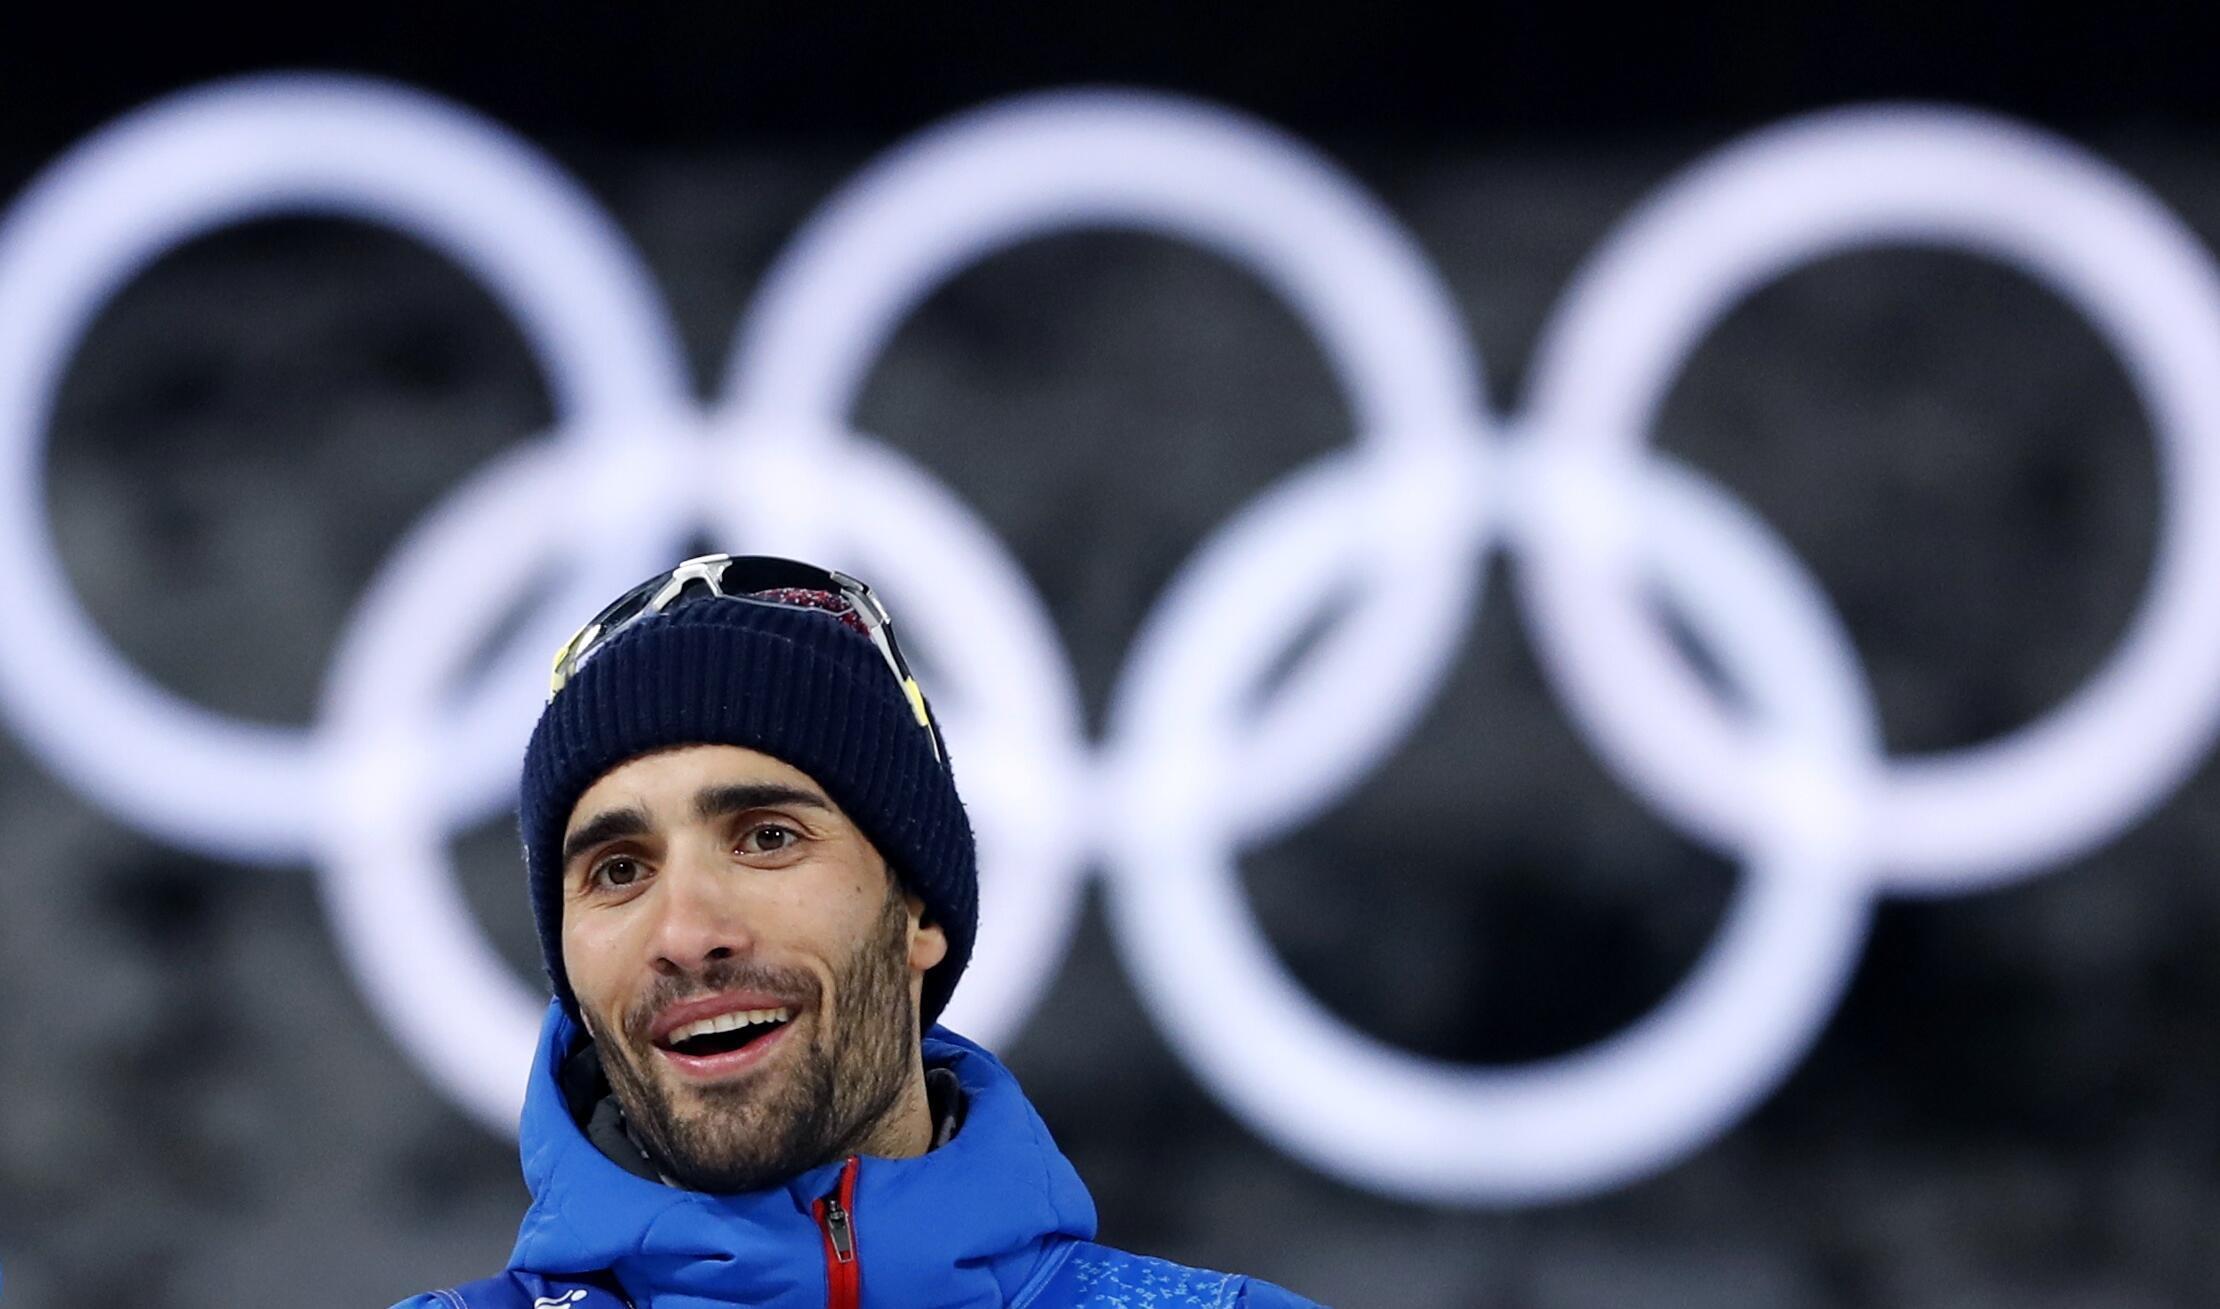 Самый титулованый французский олимпиец — Мартен Фуркад.